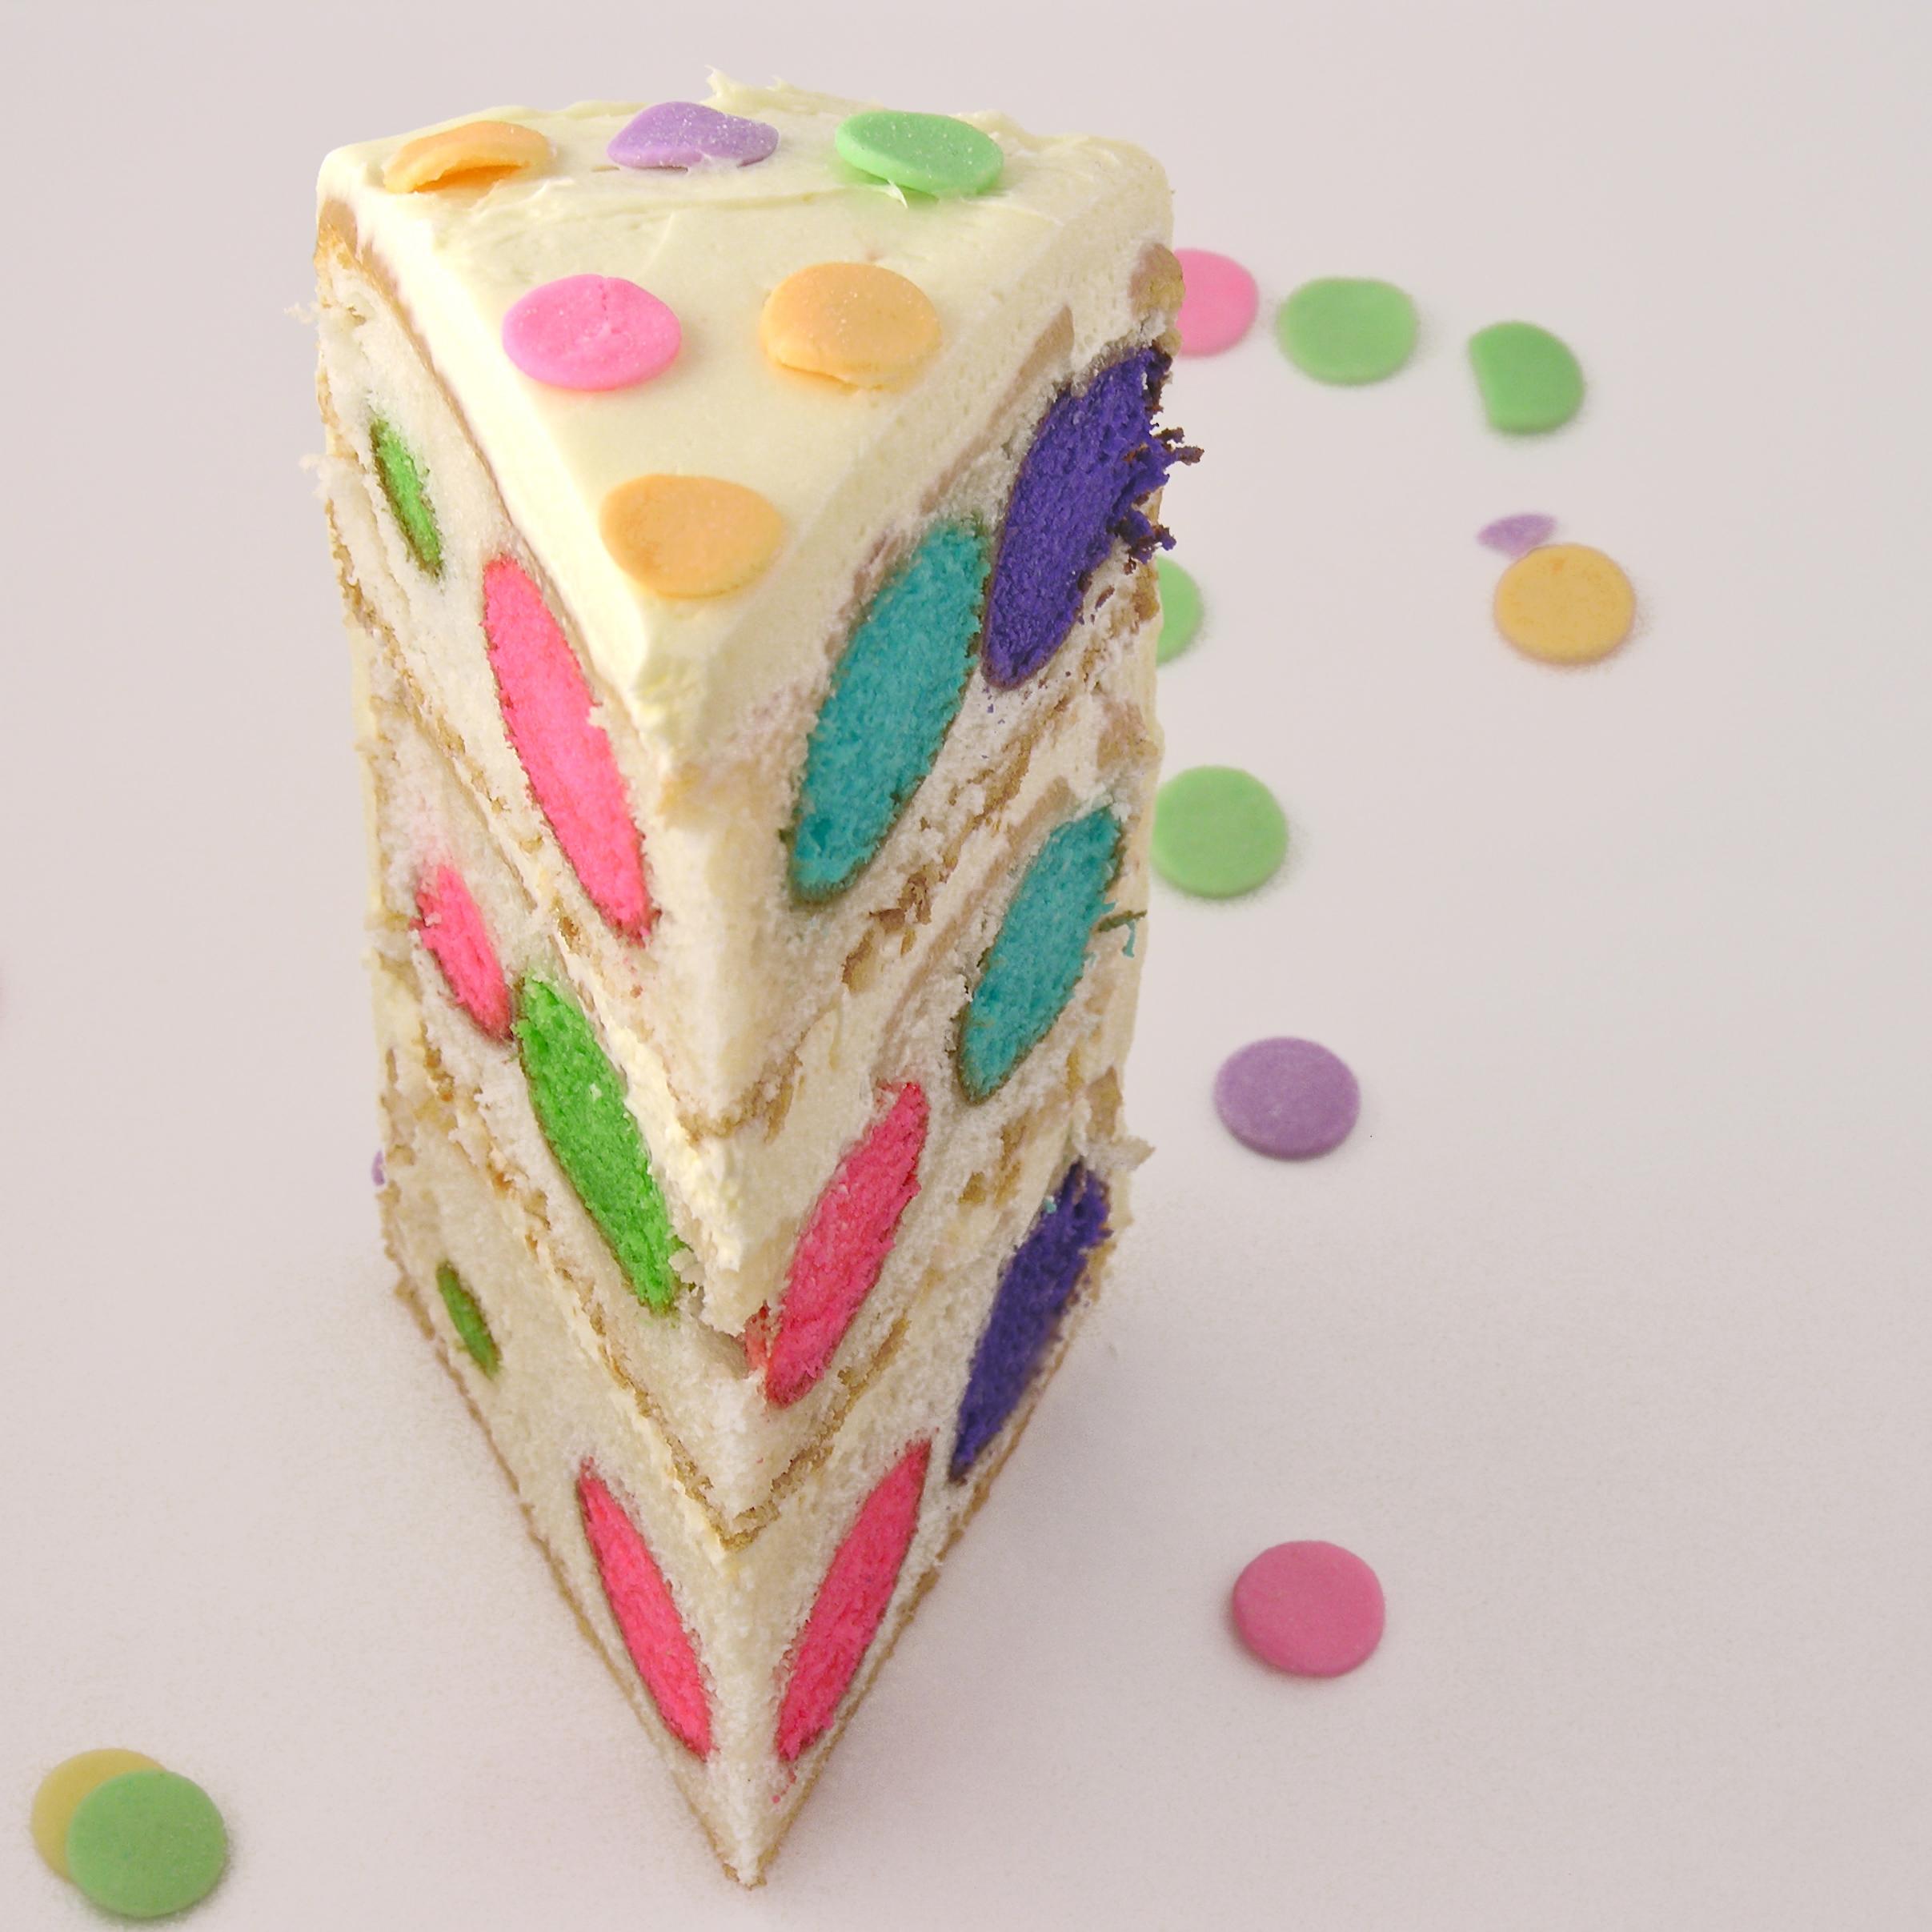 pattern inside a cake eASYbAKED